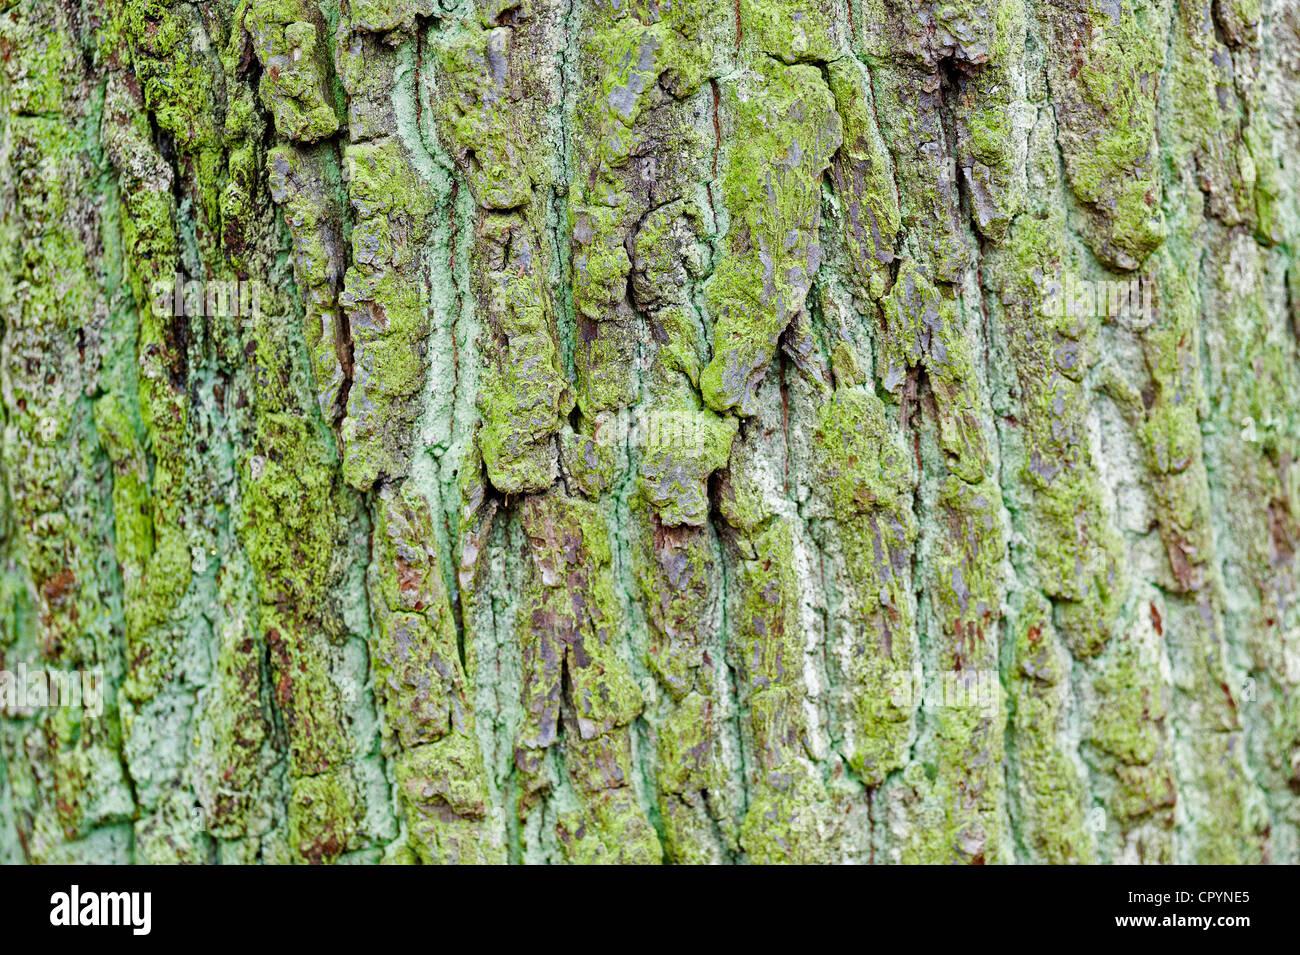 Coloured Bark Stock Photos & Coloured Bark Stock Images - Alamy